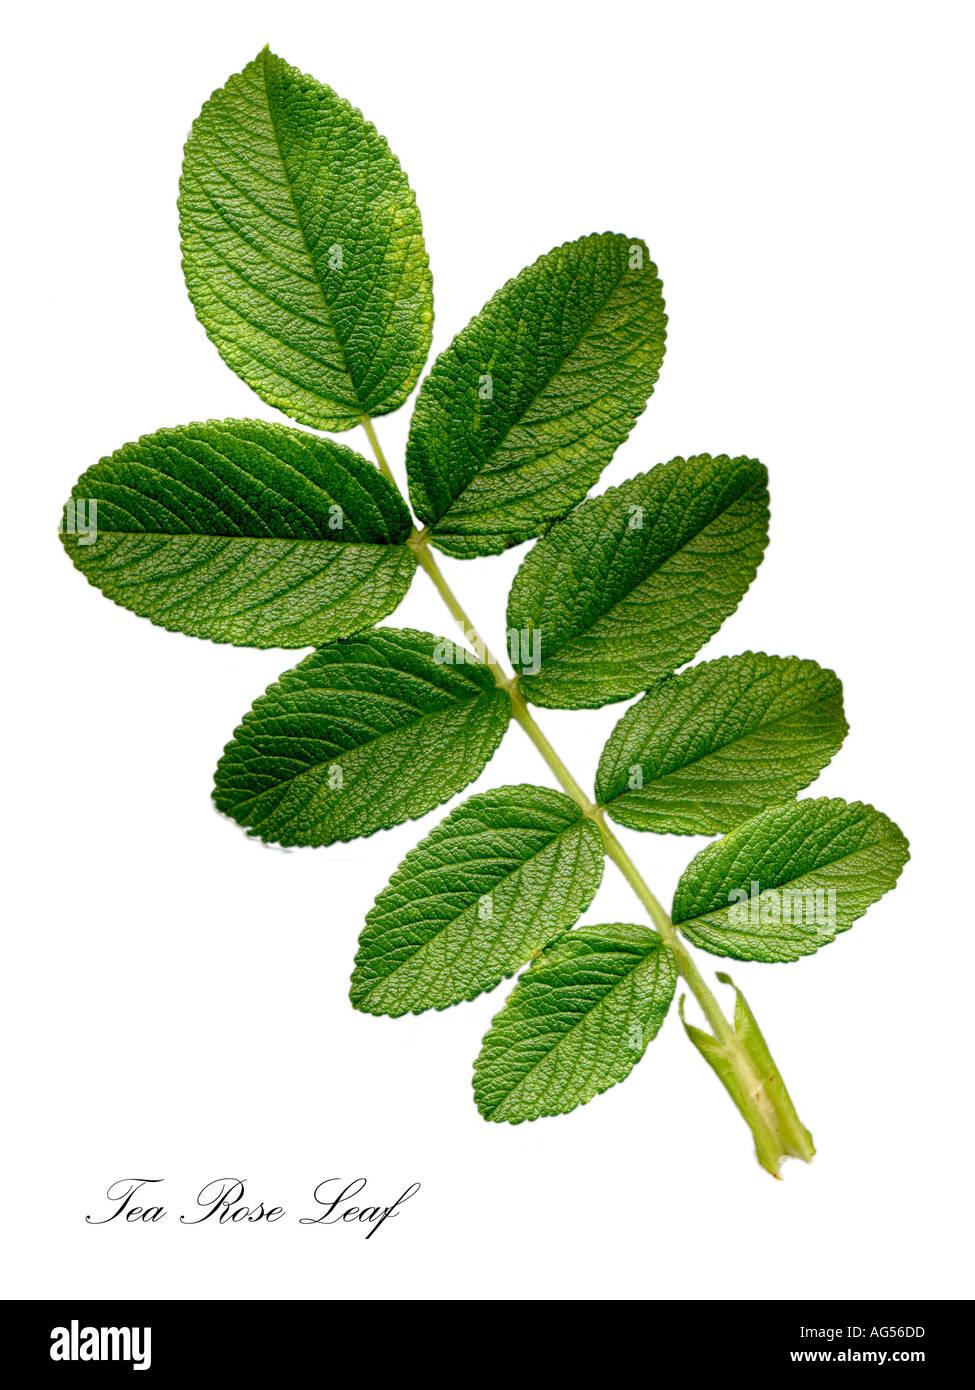 Tea Rose Leaf Stock Photo Royalty Free Image 1070812 Alamy